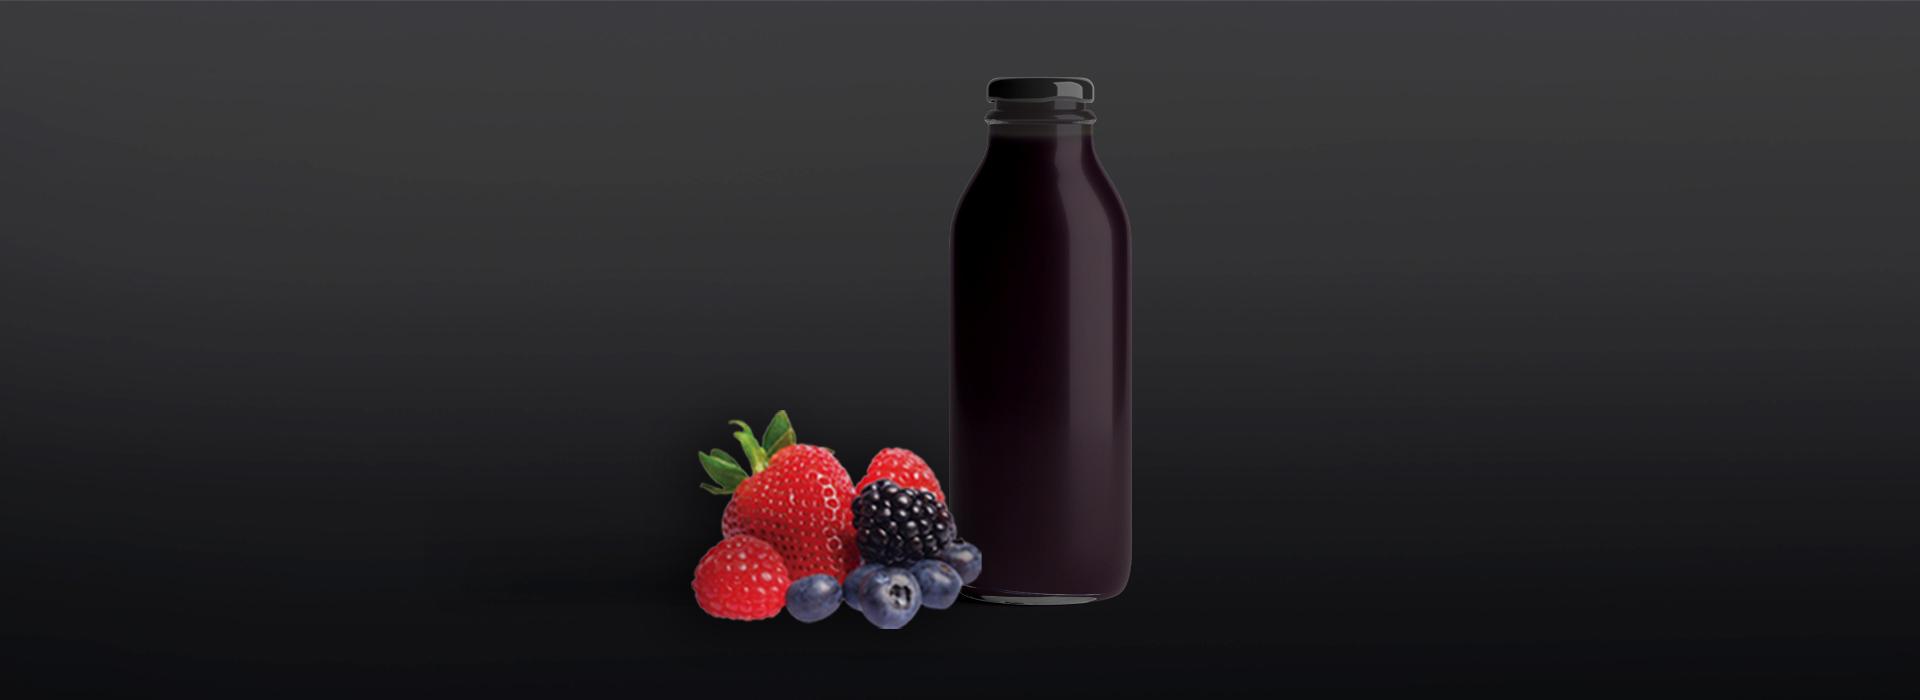 sraml-berry-juice